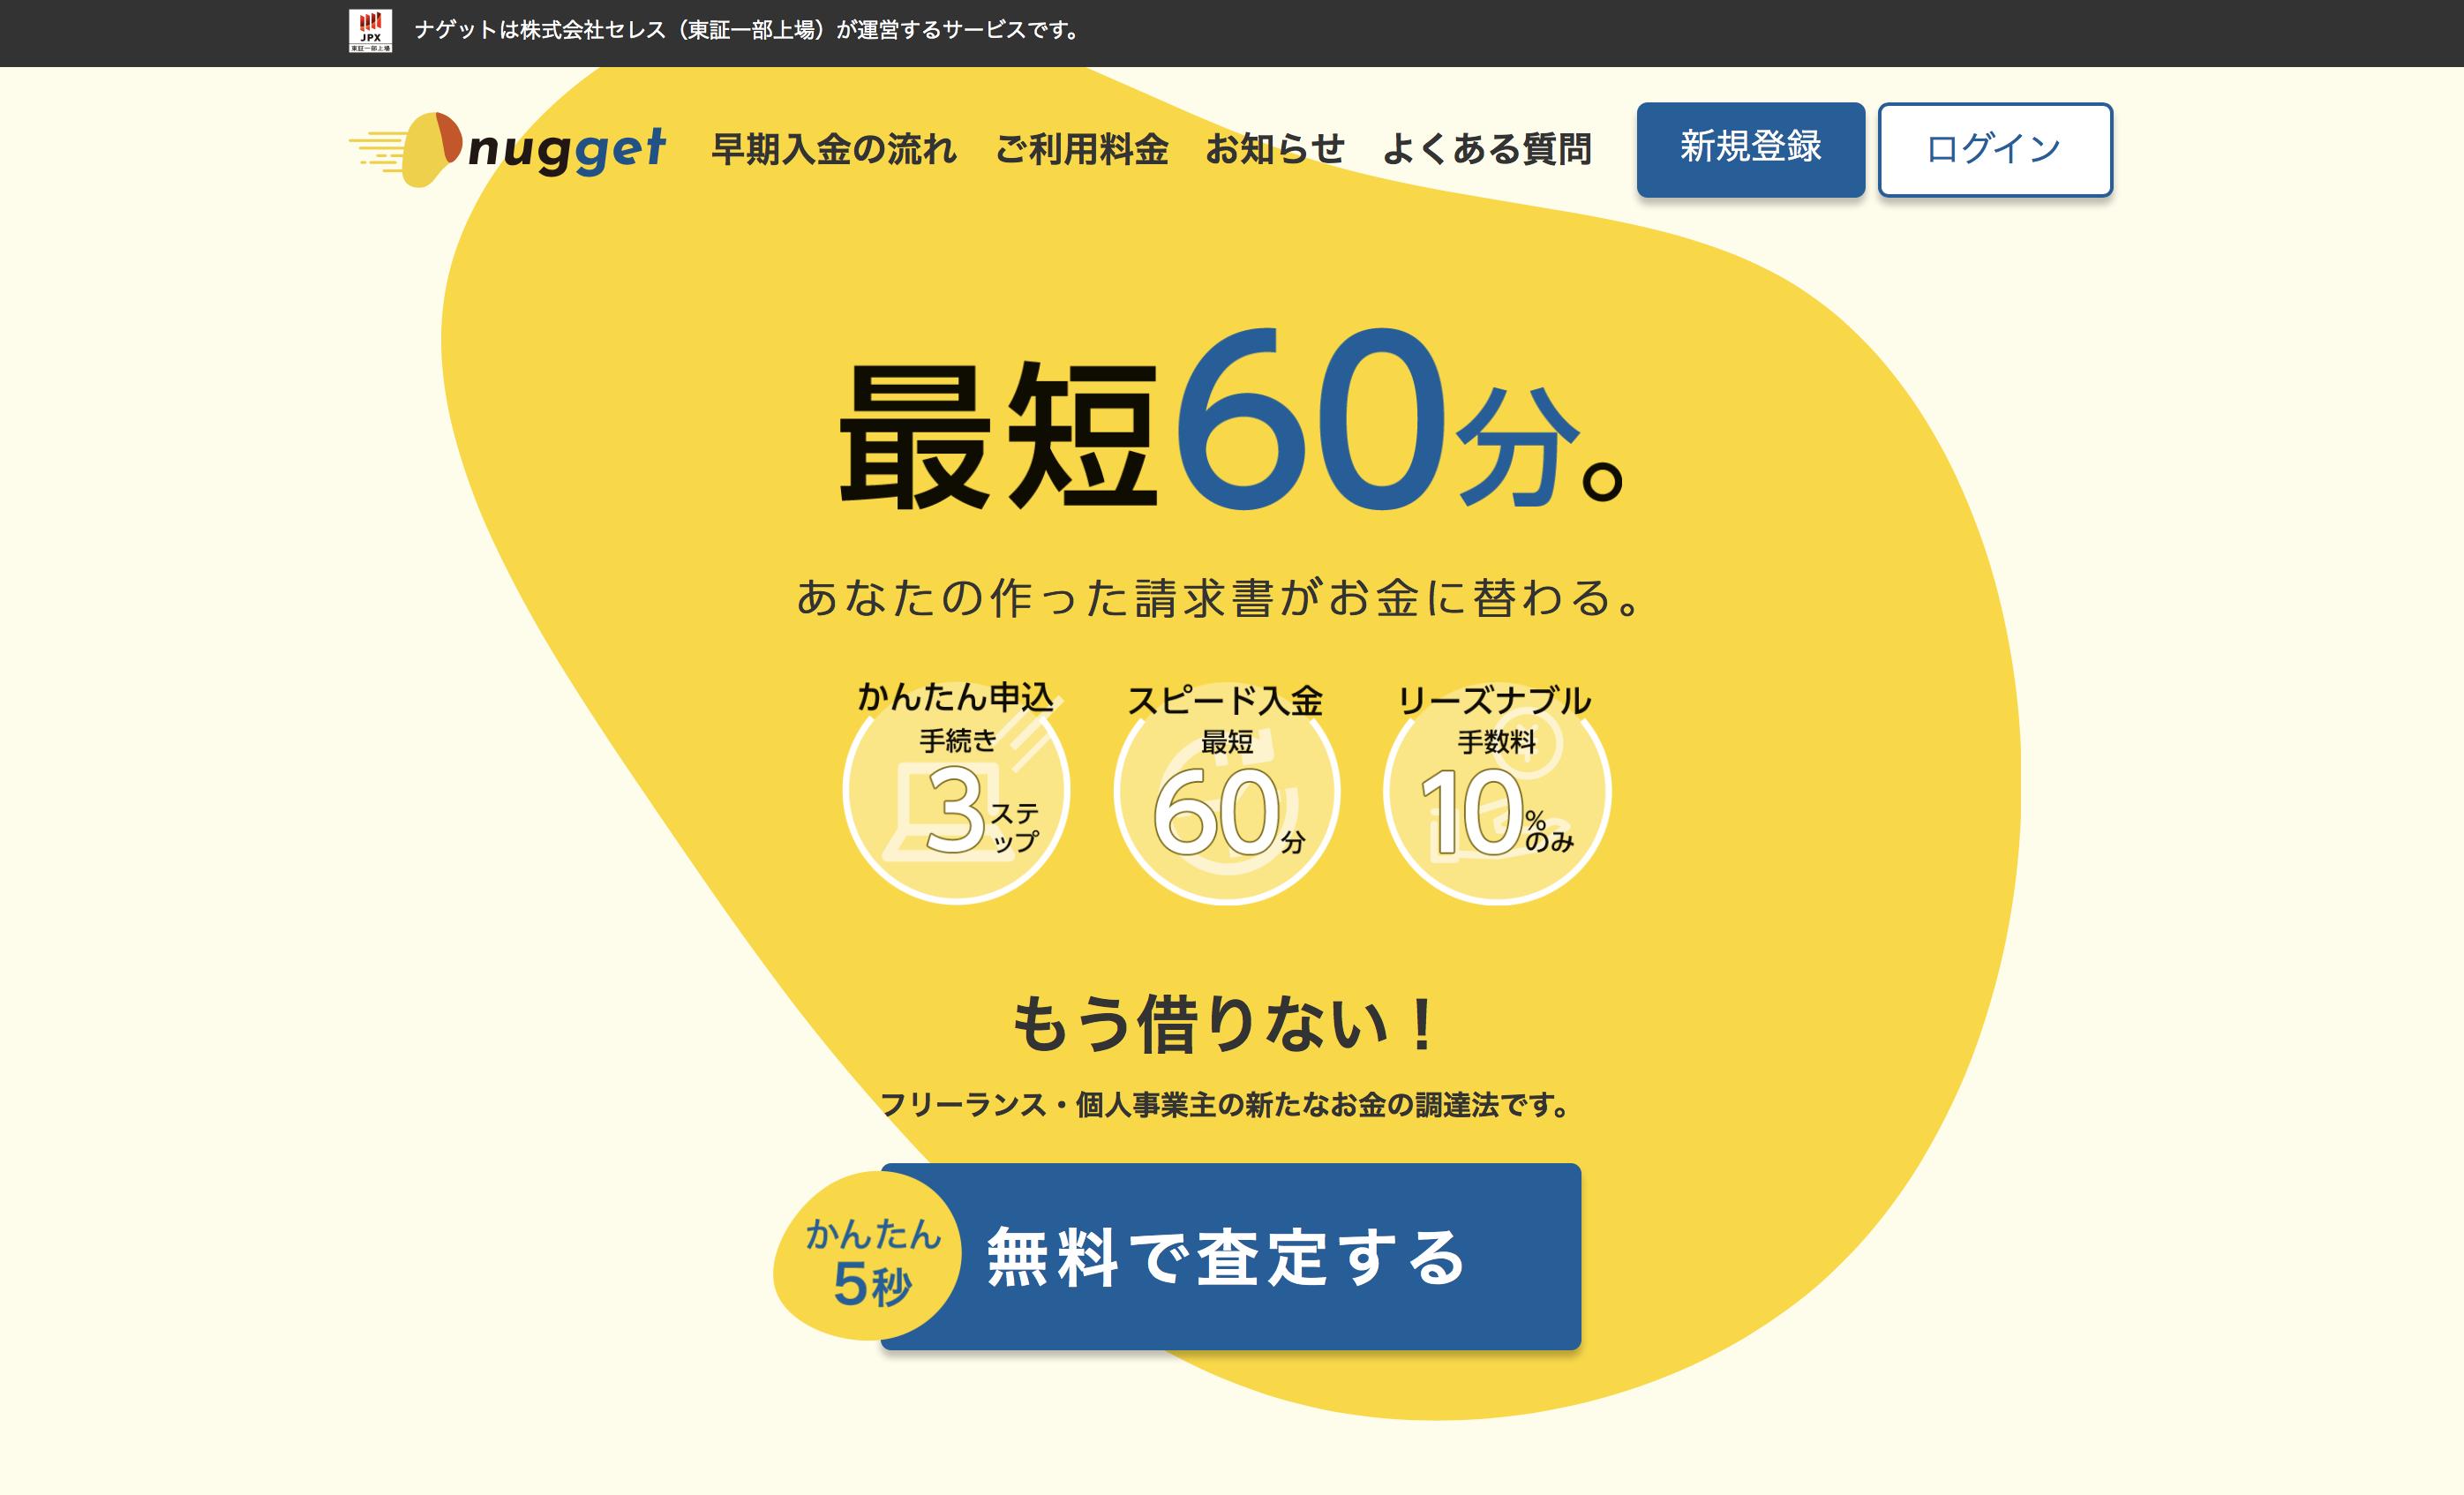 nugget(ナゲット)